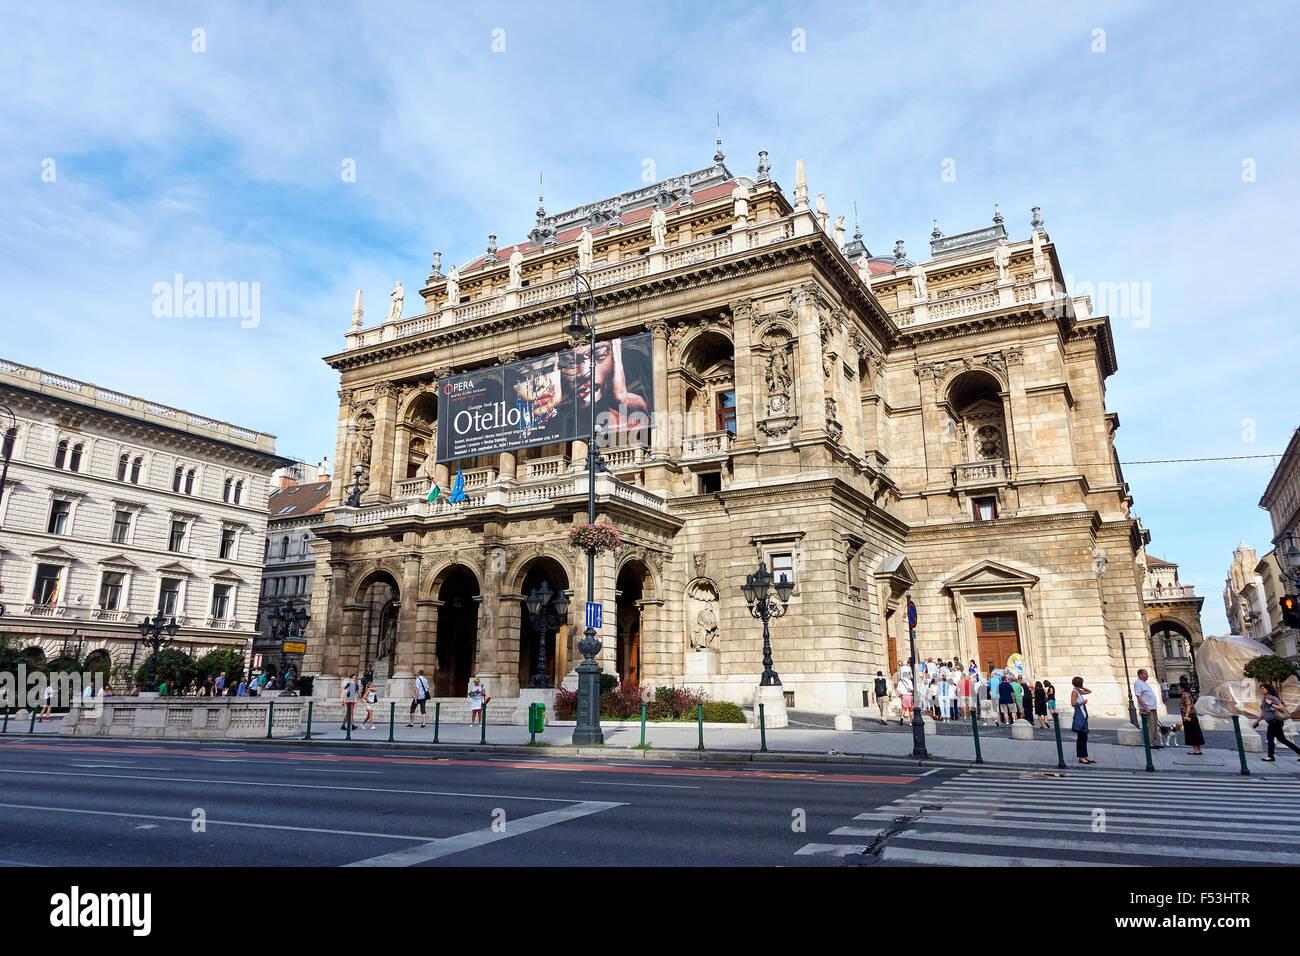 Hungarian State Opera House, Budapest, Hungary - Stock Image